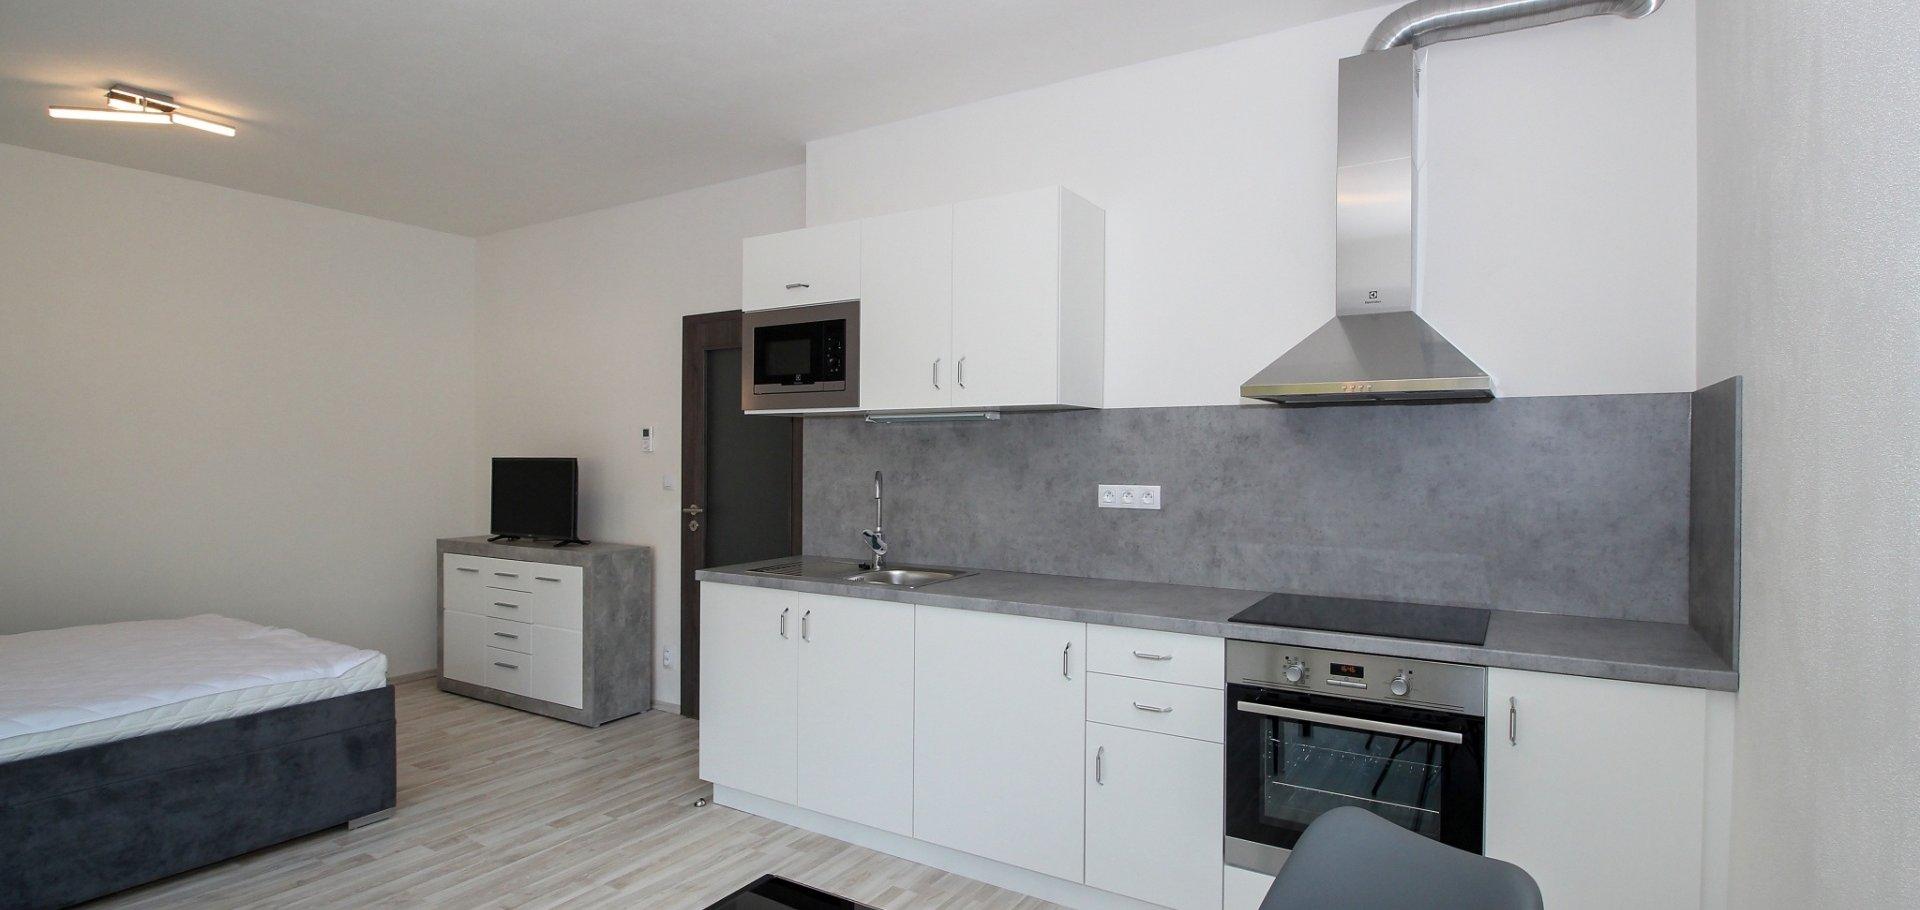 Pronájem bytu 1+kk, 36 m² - Plzeň - Valcha